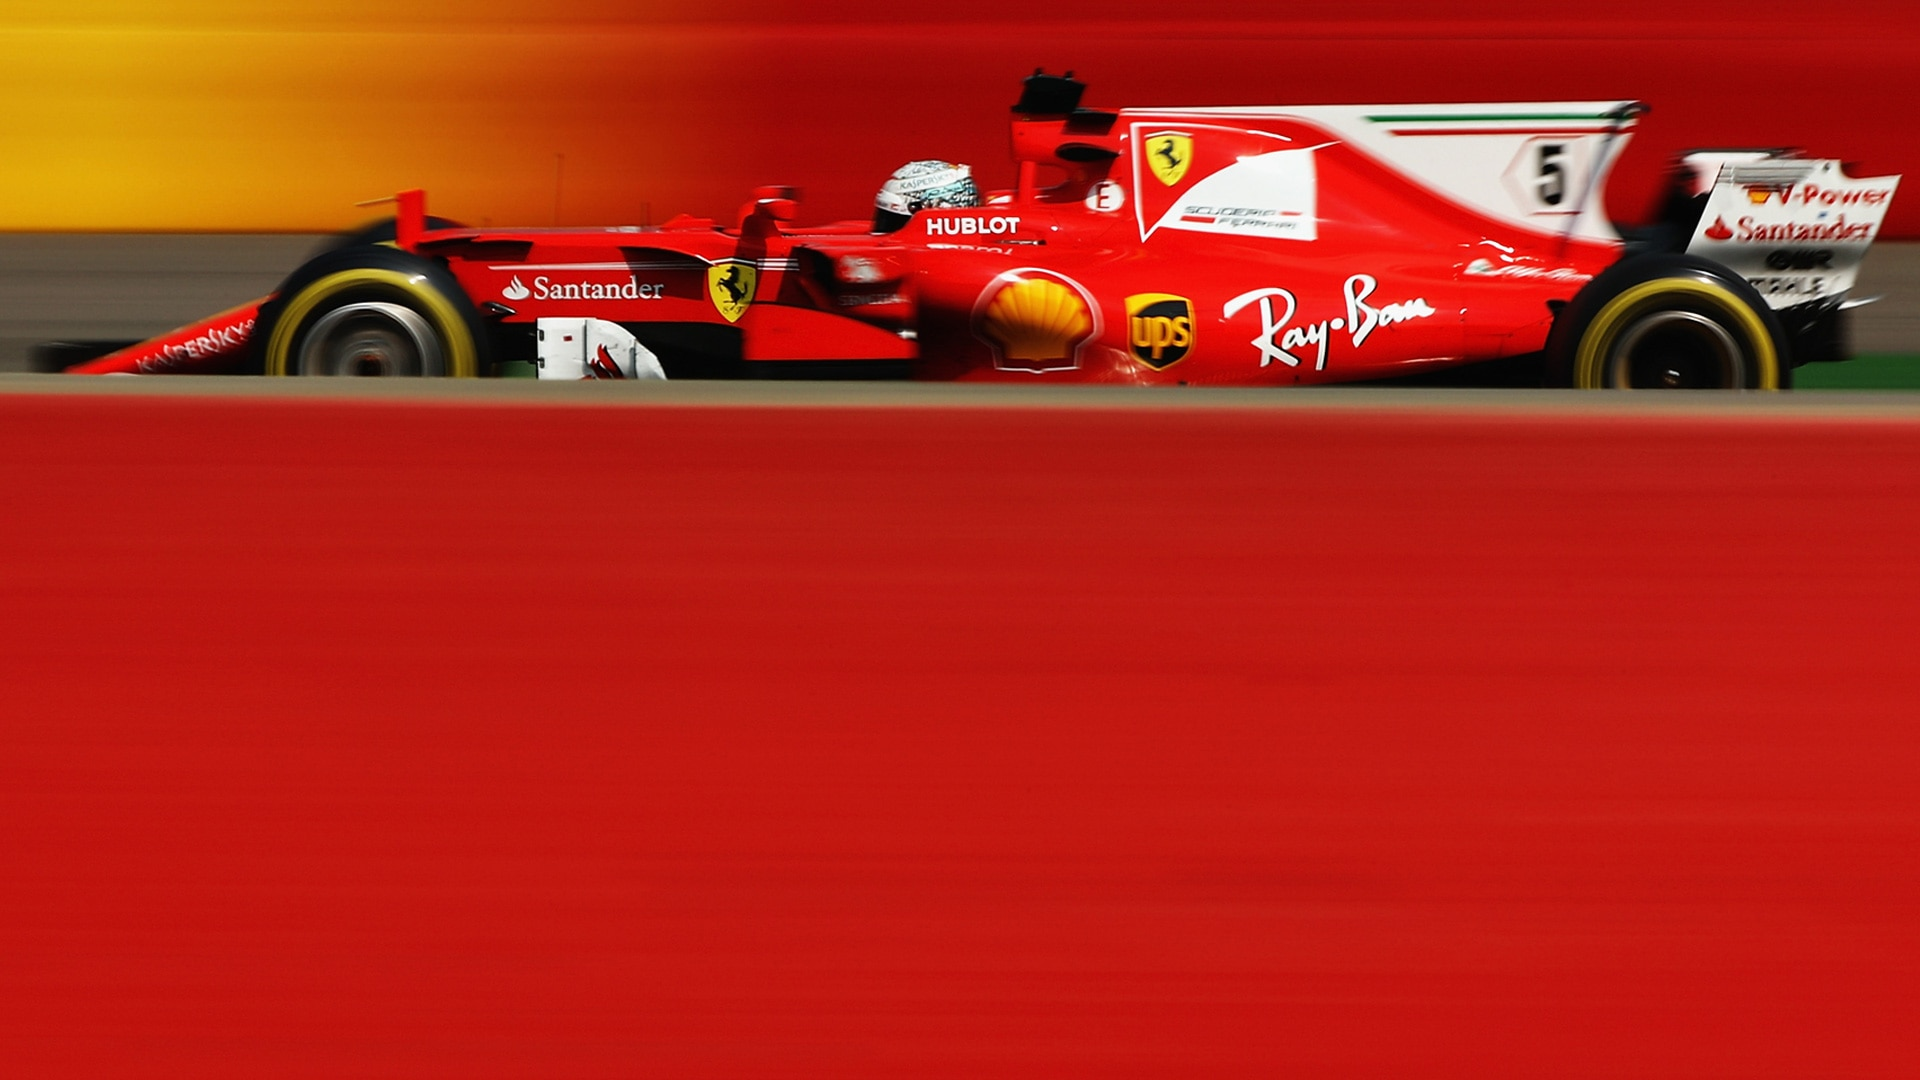 High Quality F1 Photos